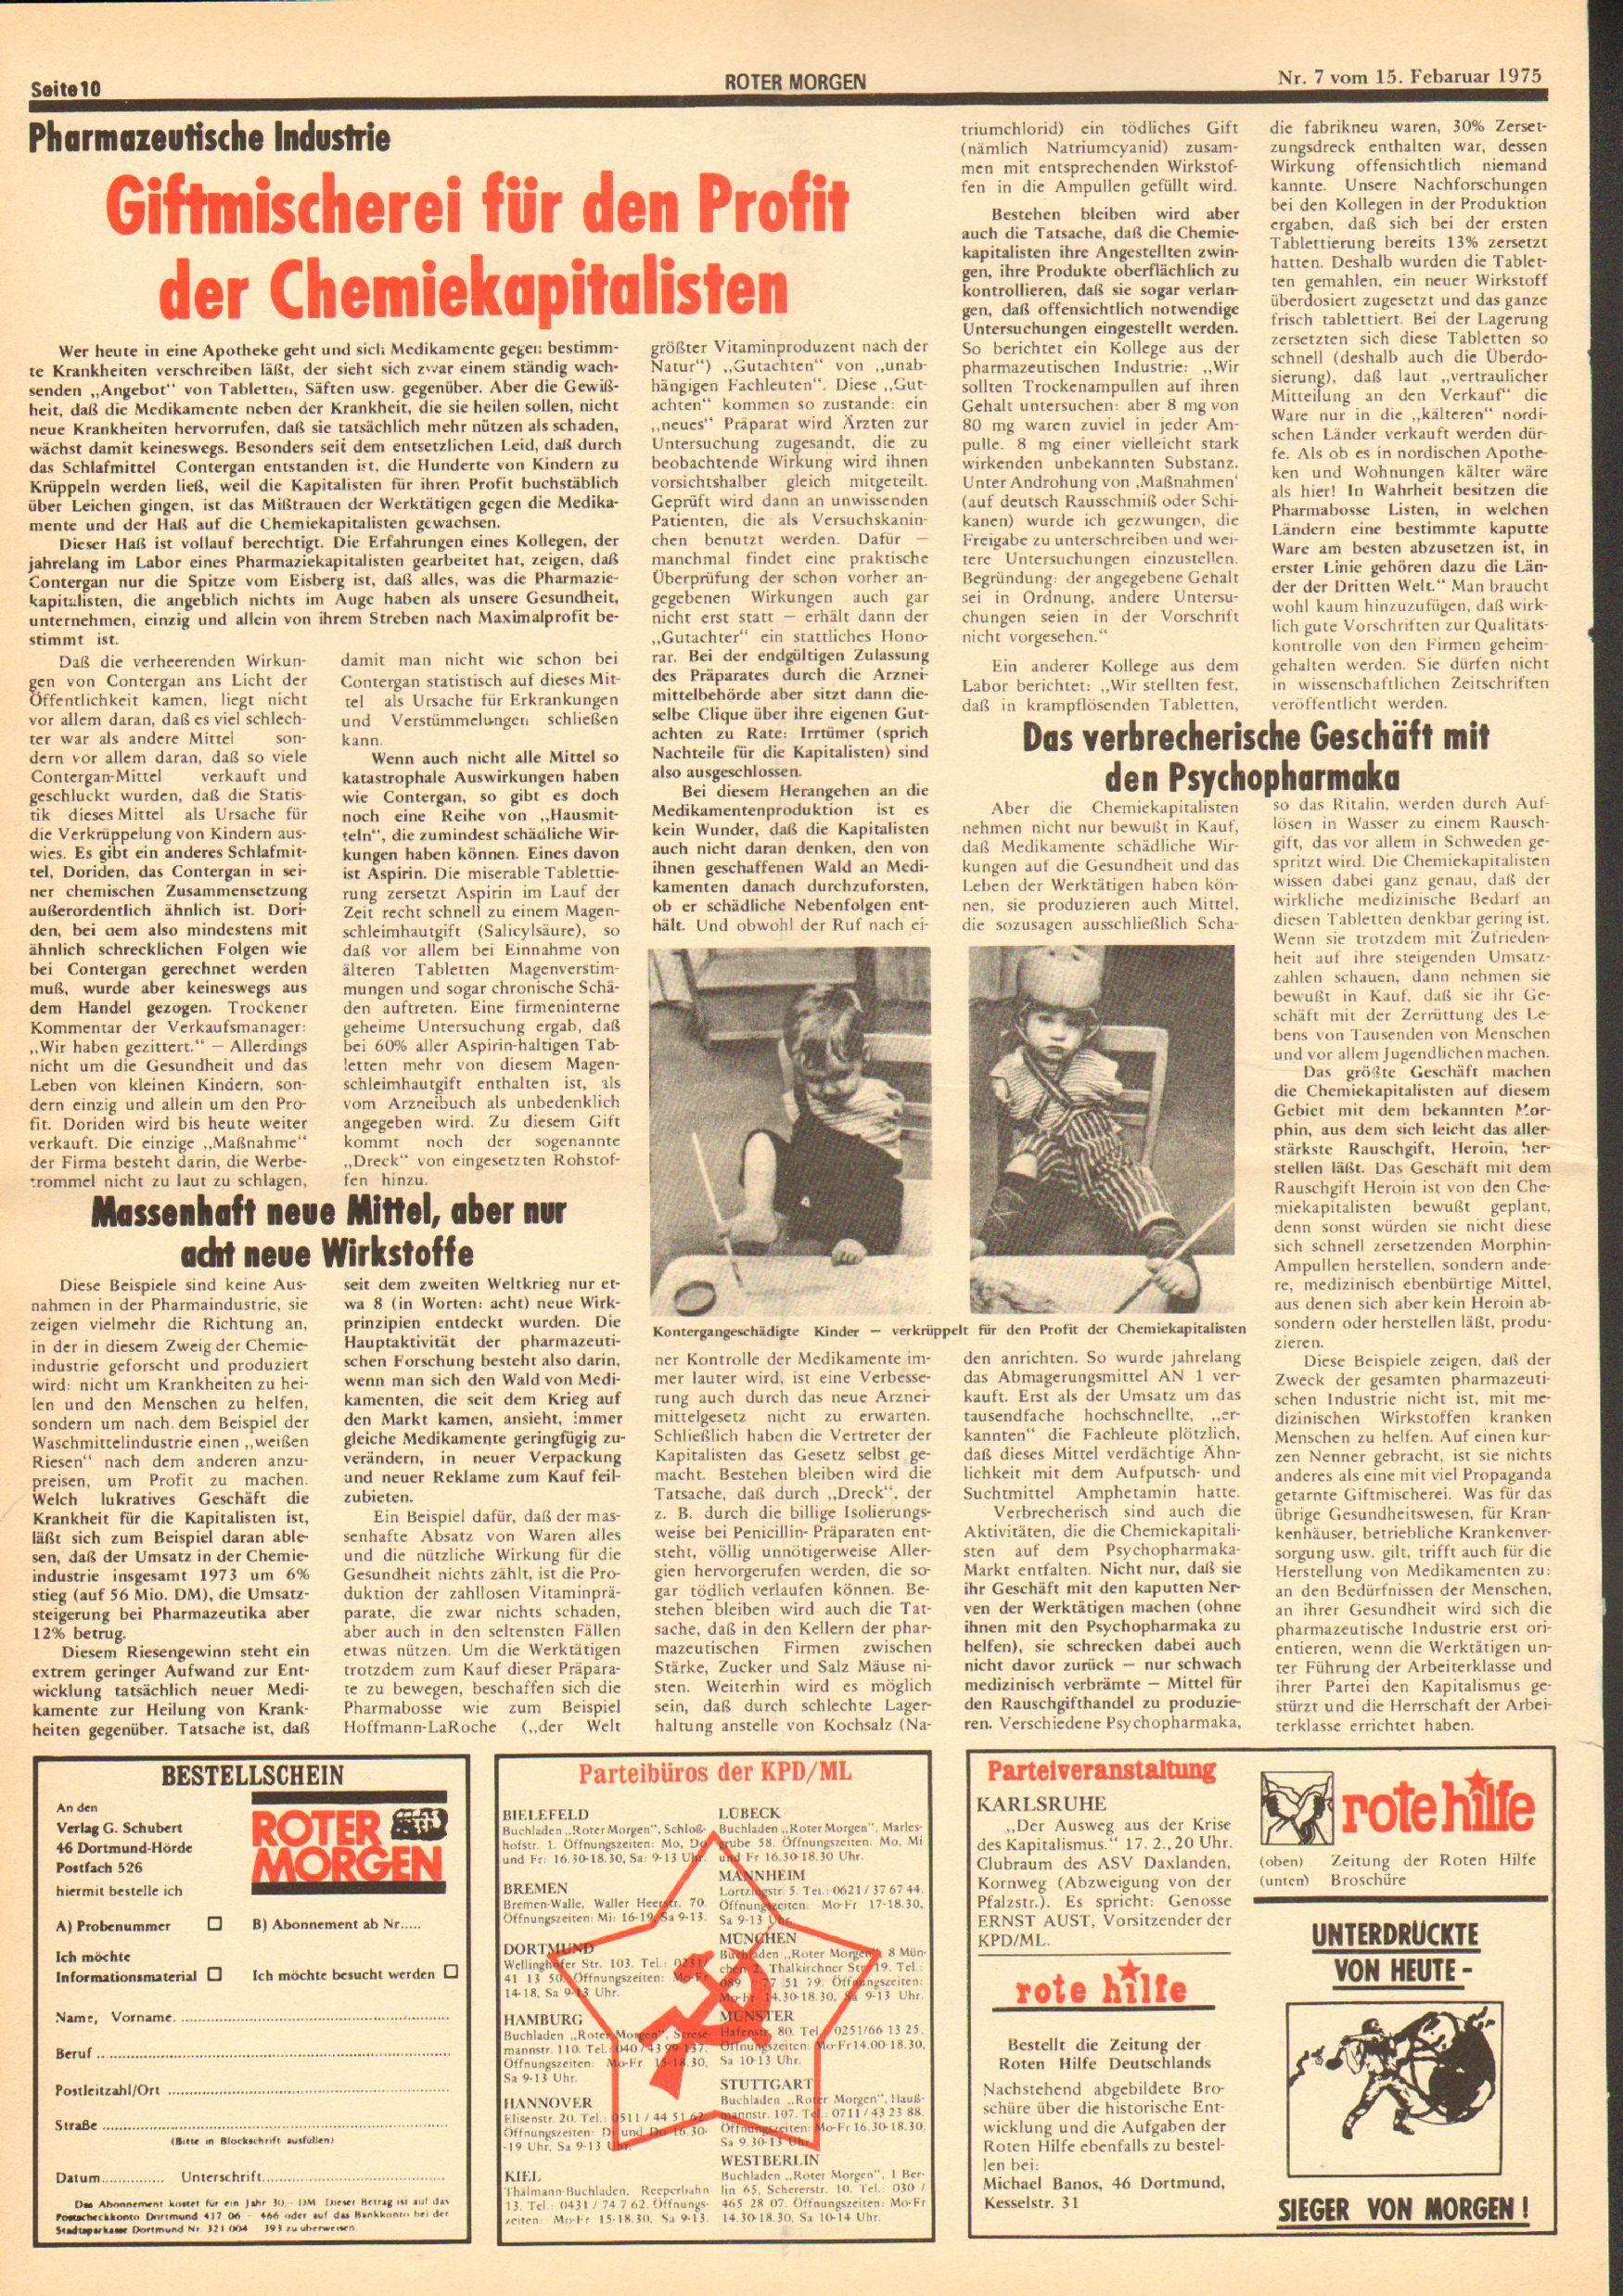 Roter Morgen, 9. Jg., 15. Februar 1975, Nr. 7, Seite 10